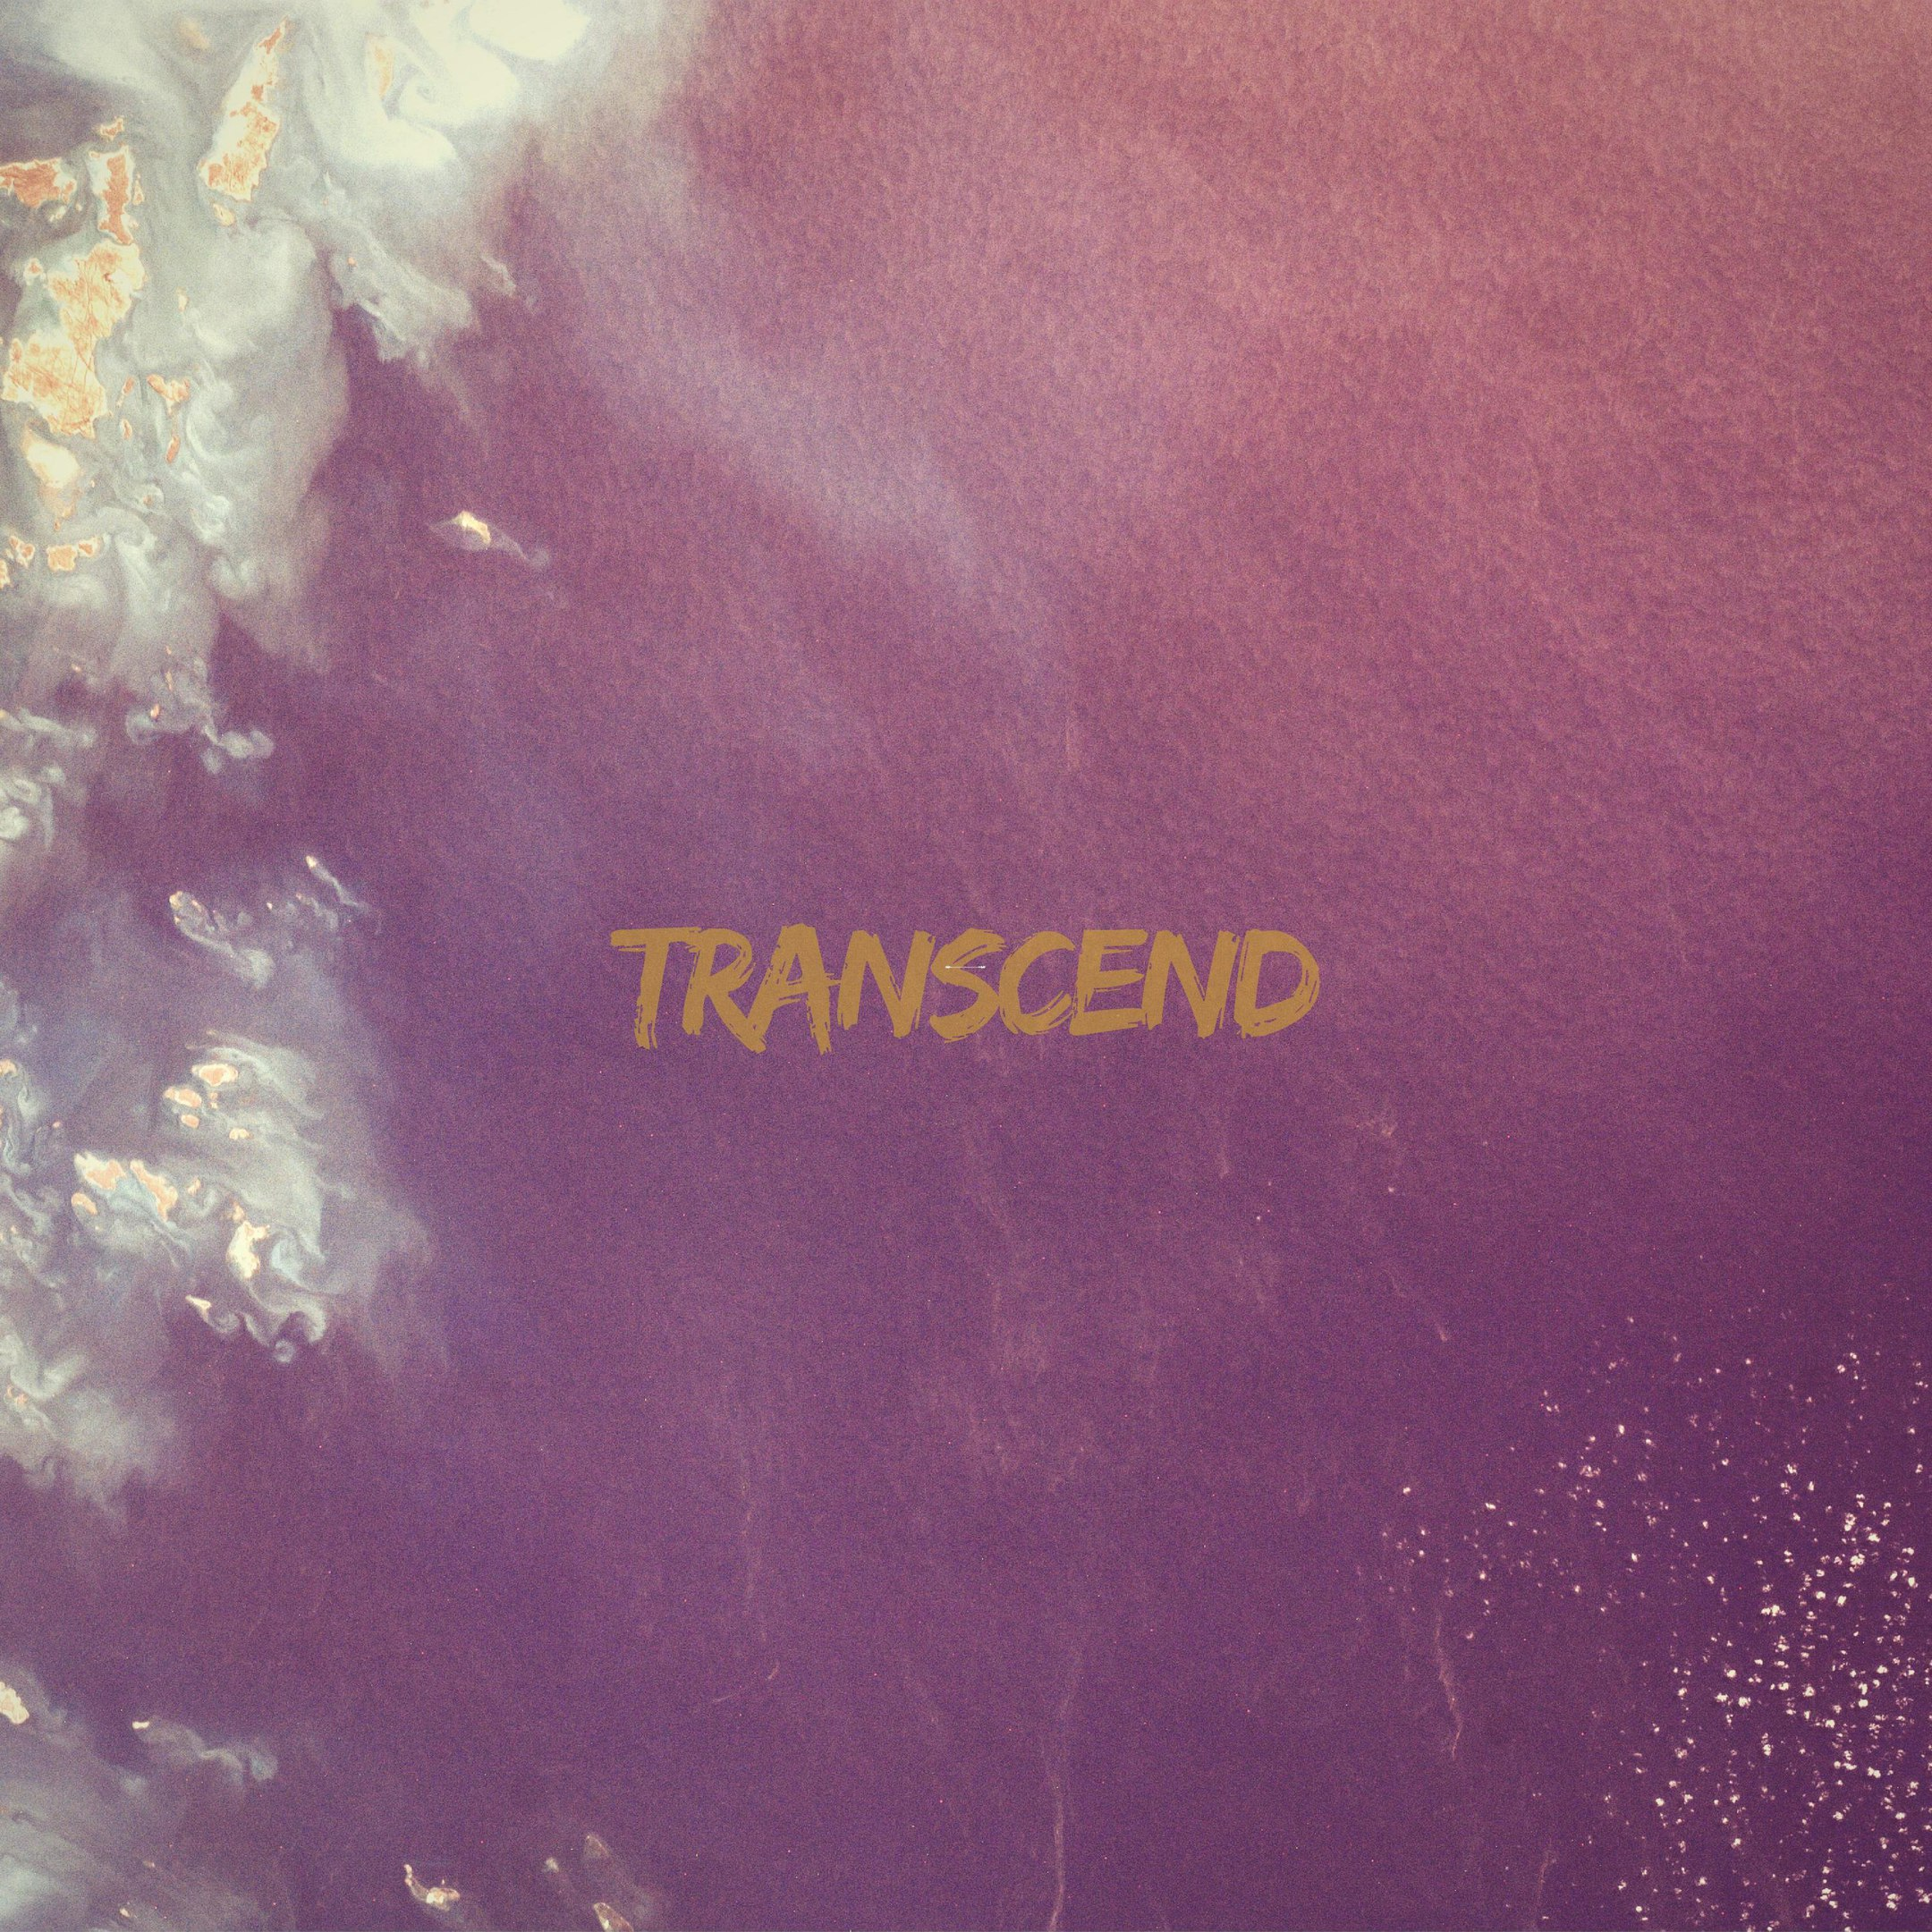 The Fragment - Transcend [single] (2018)